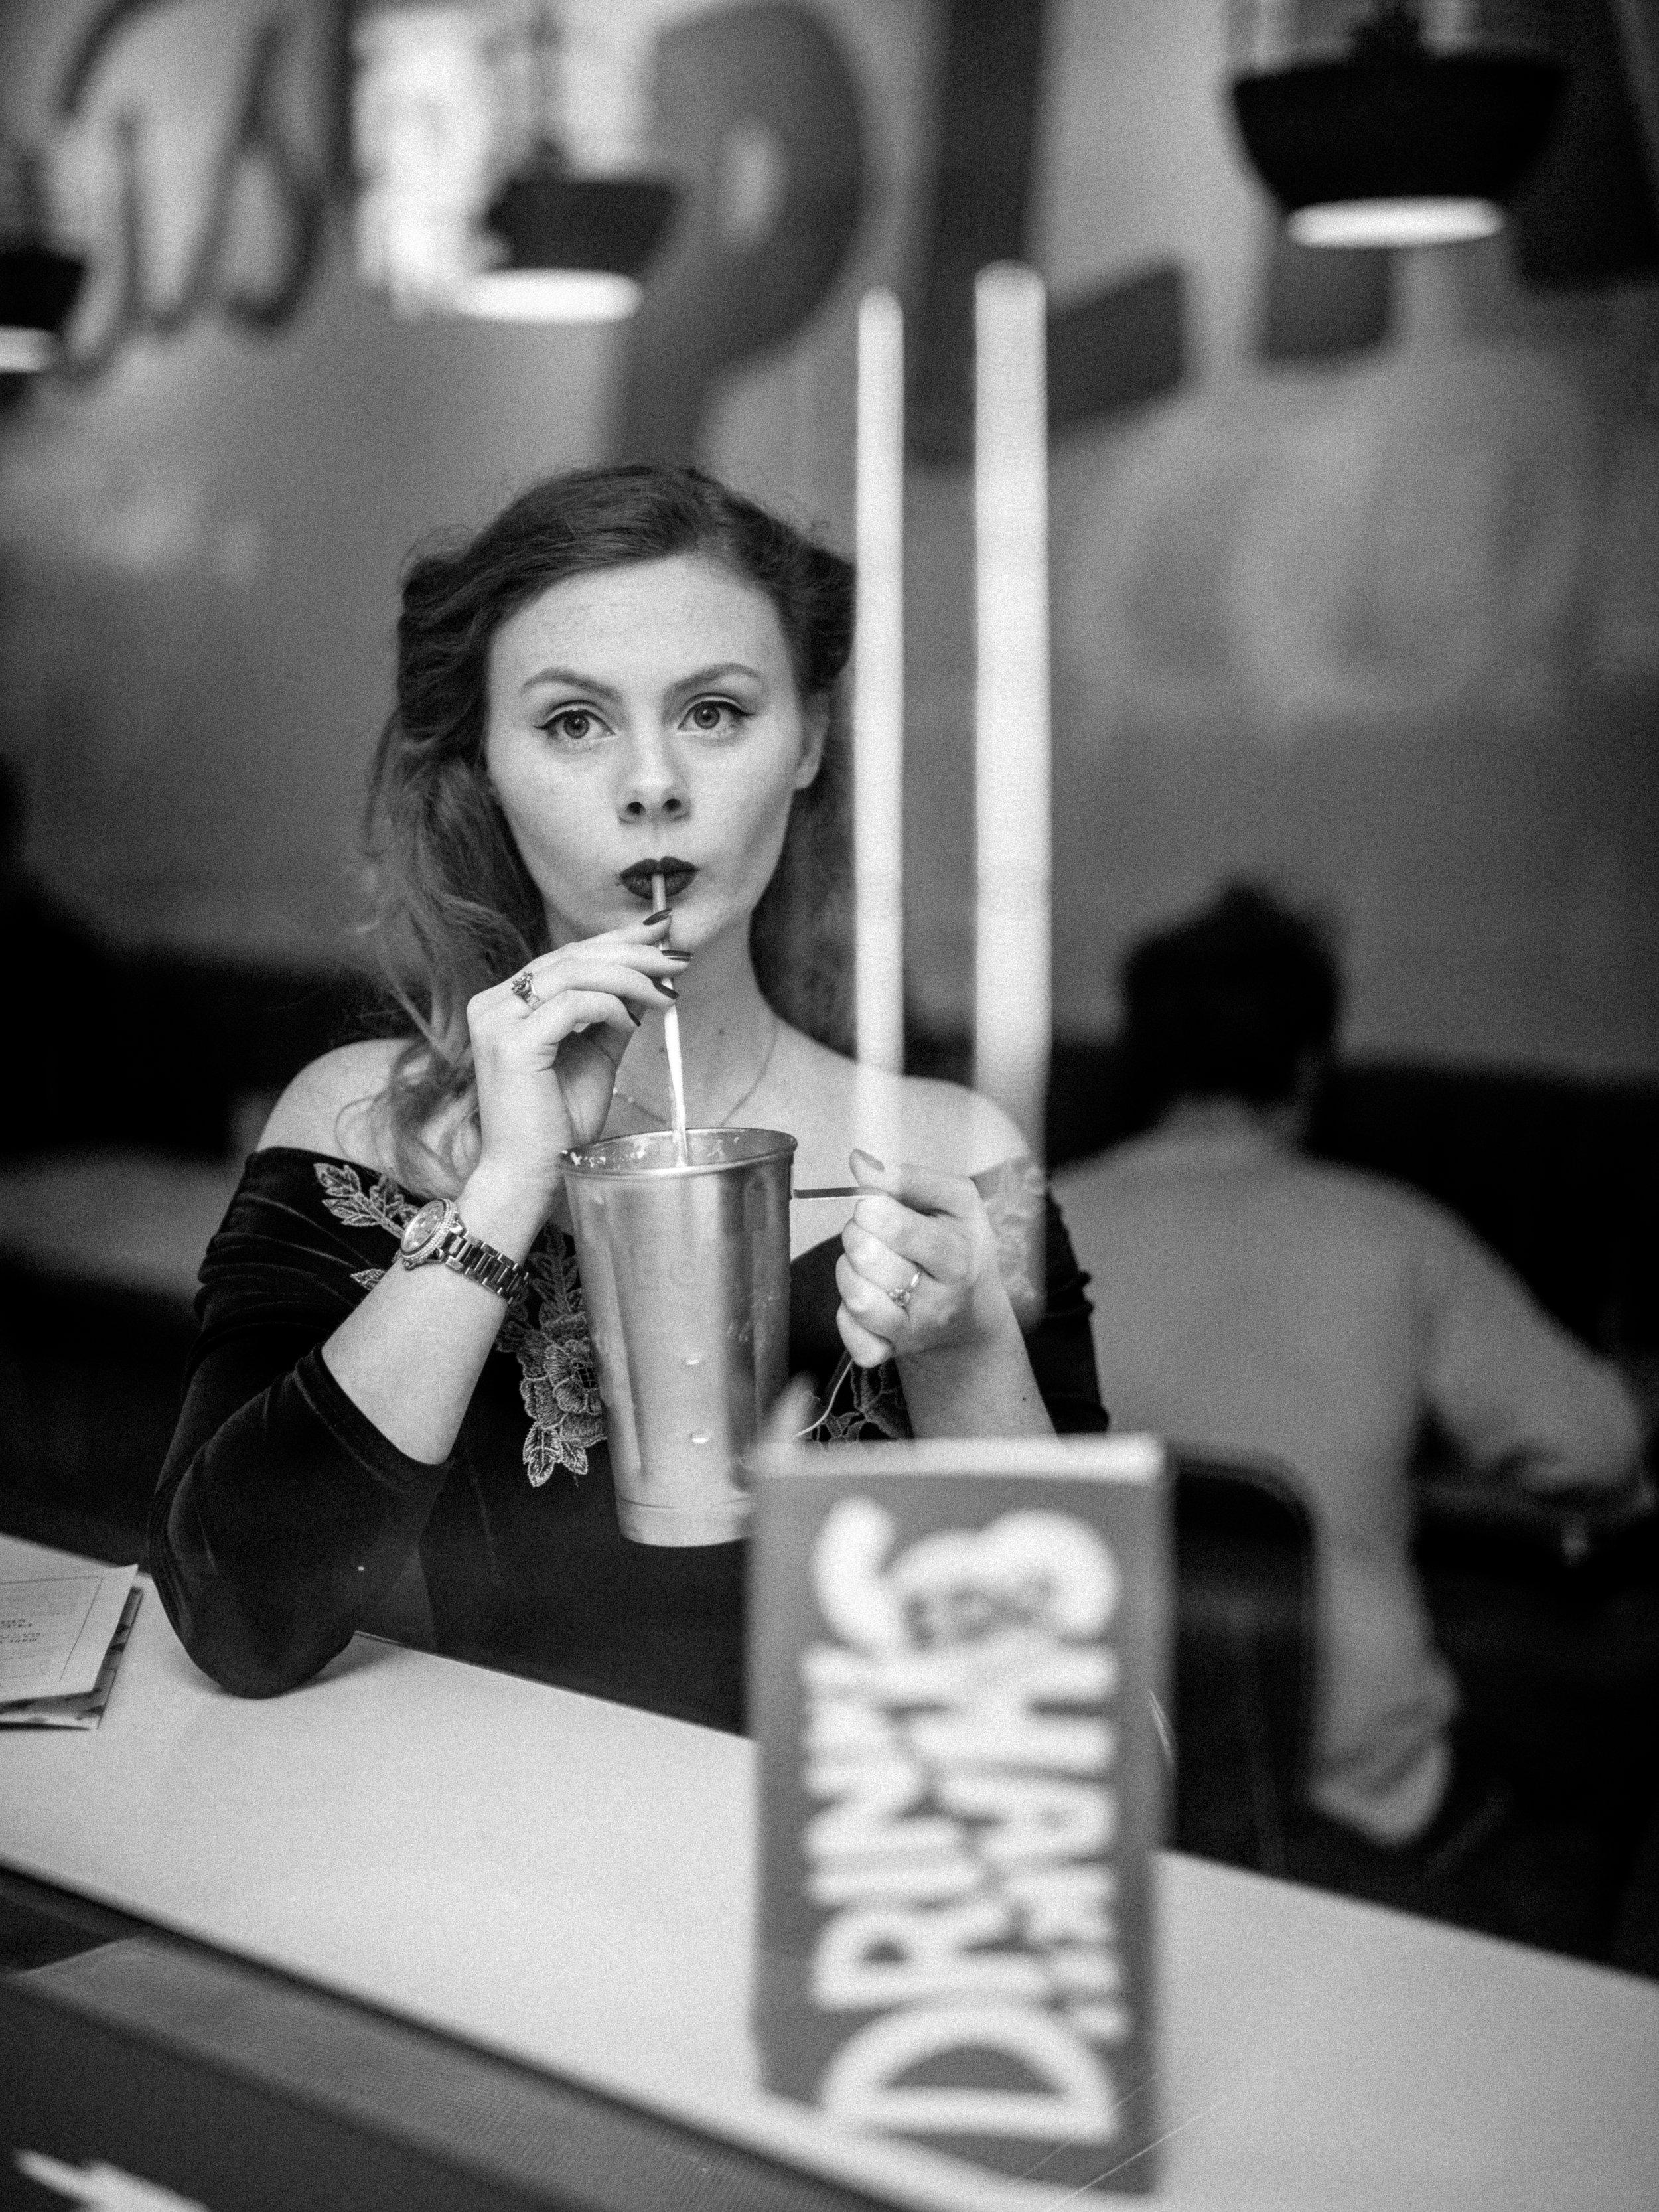 Retro Portraits Ed's Diner 1950s